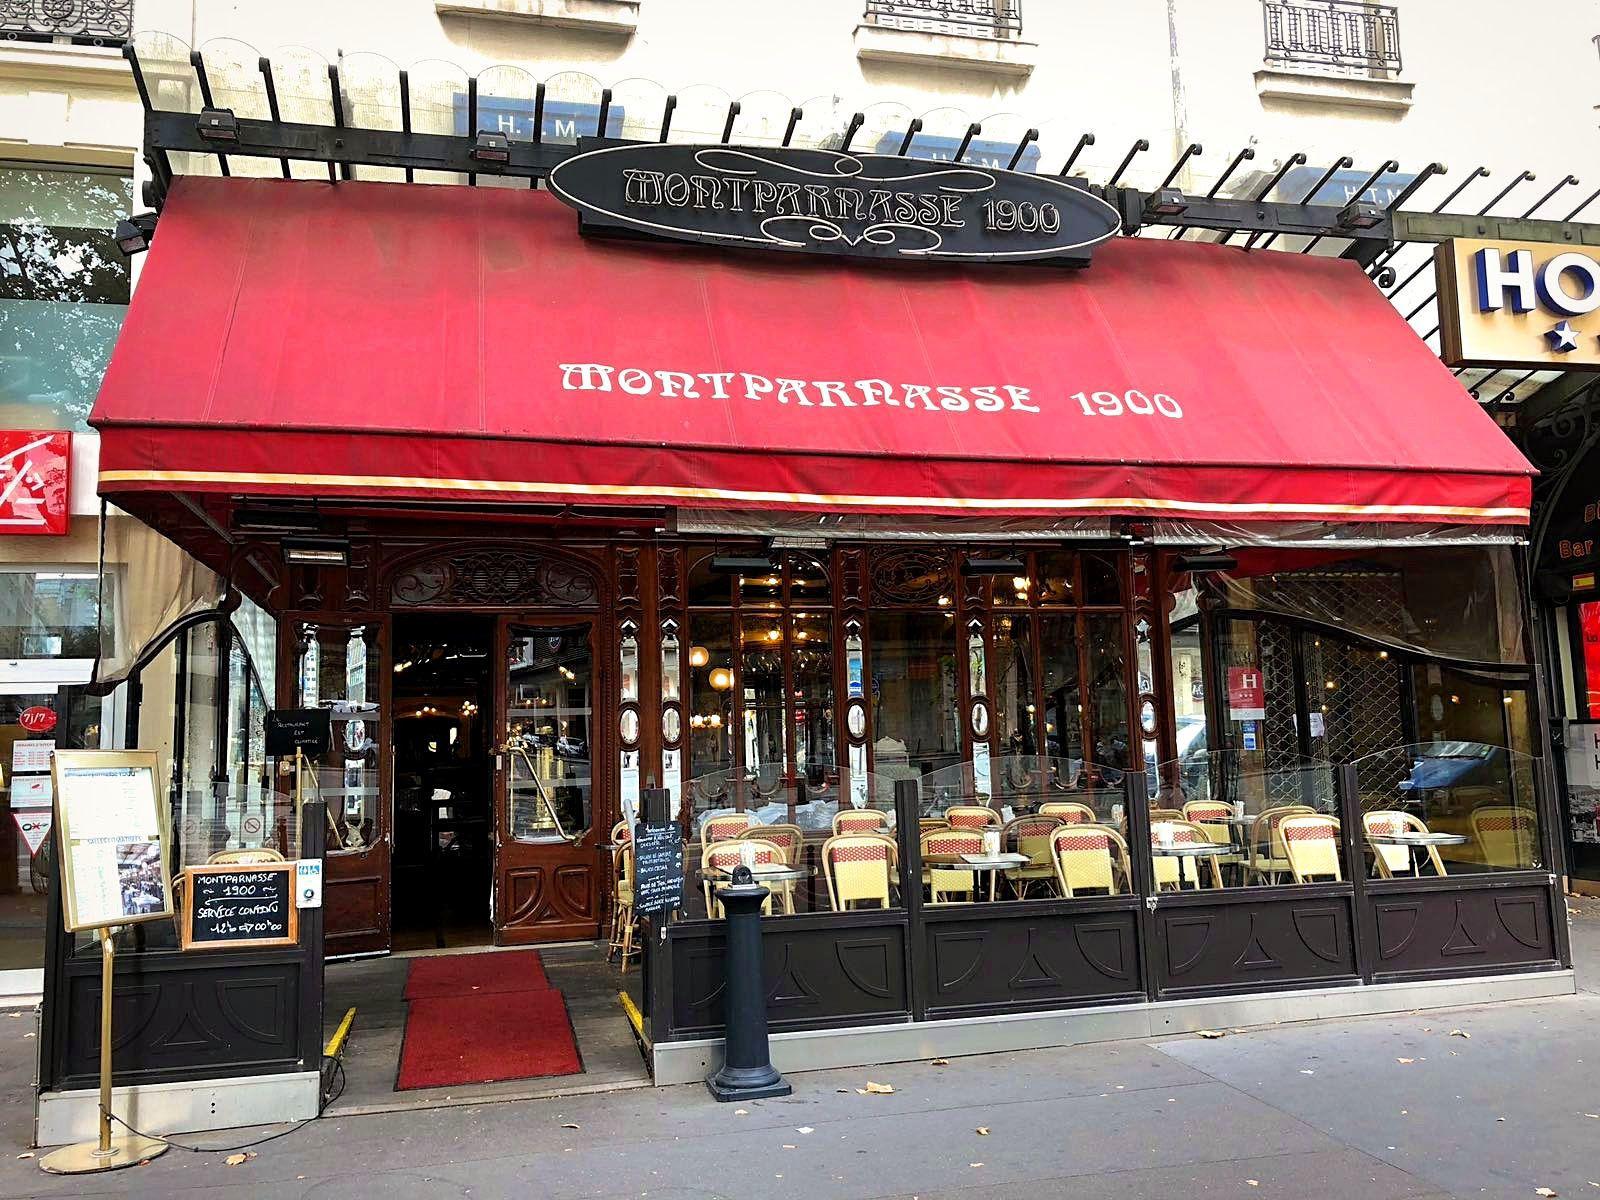 Promenade parisienne... 6ème arrondissement, Restaurant Montparnasse 1900